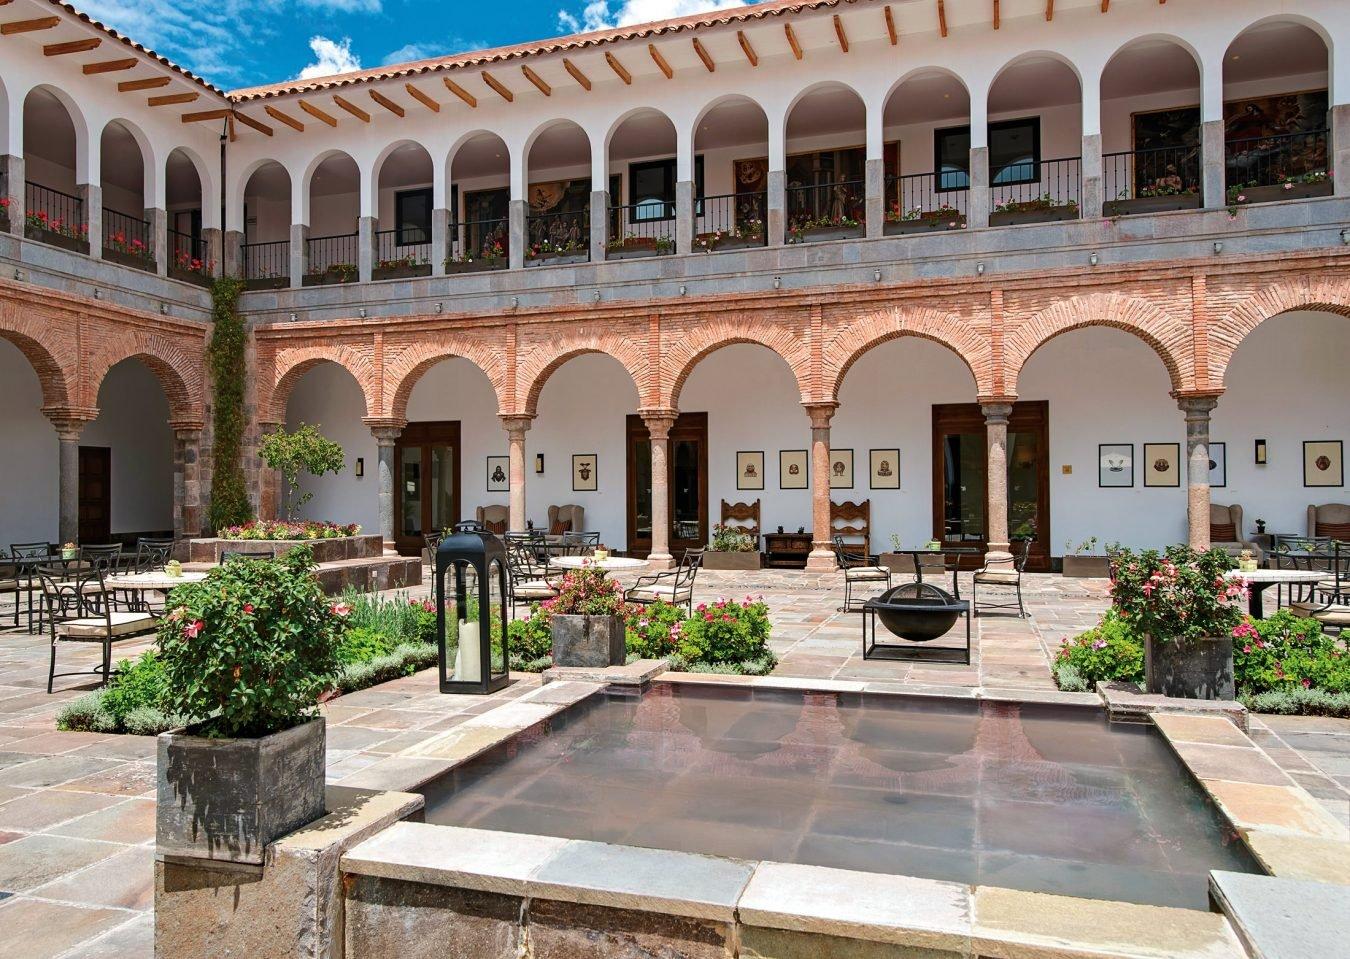 A Revitalized 16th-Century Peruvian Convent